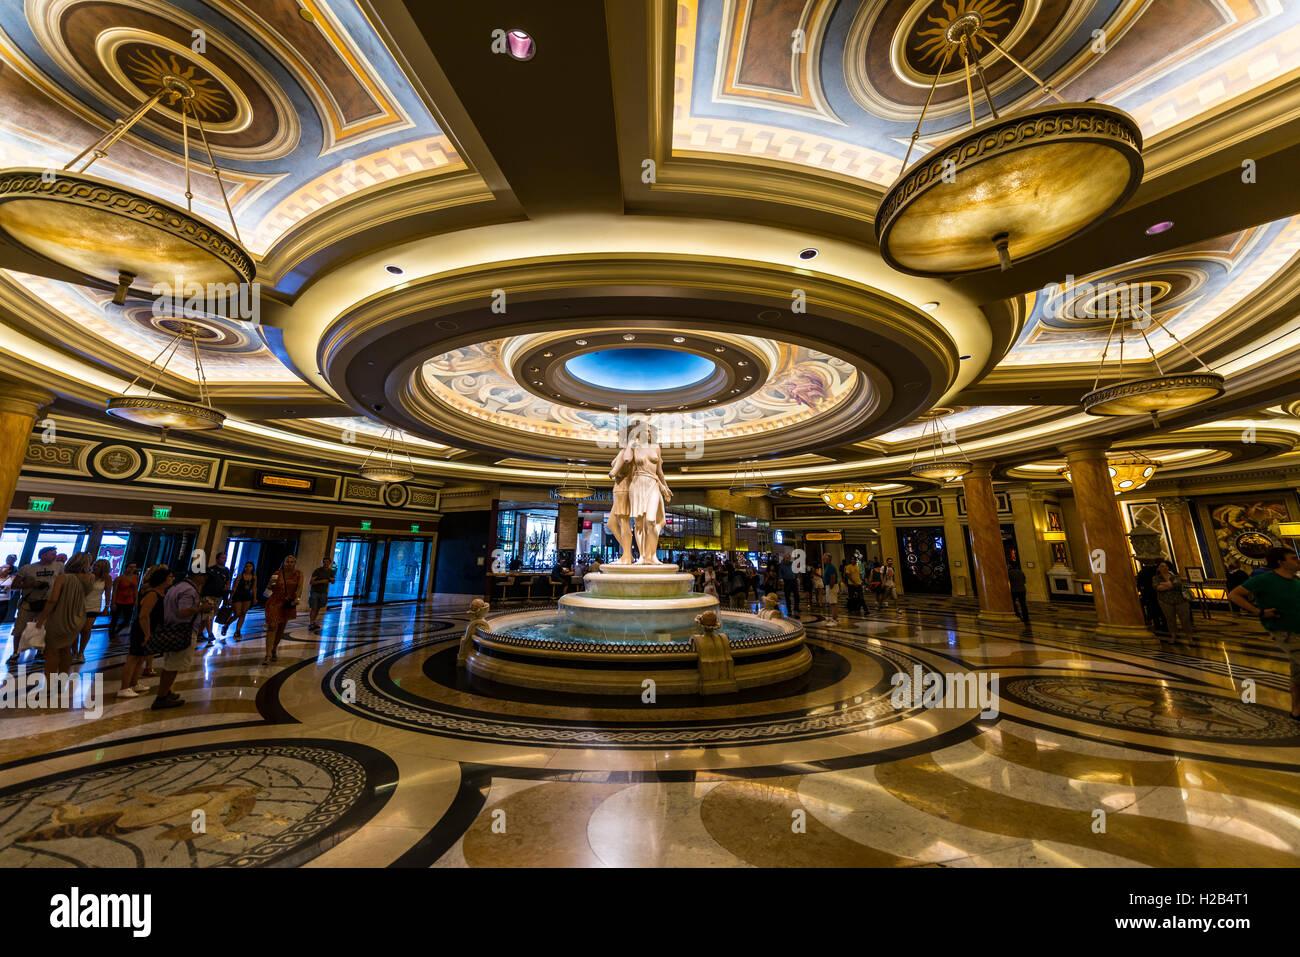 Entrance hall with Roman Statue, Caesars Palace Hotel, Las Vegas, Nevada, USA - Stock Image